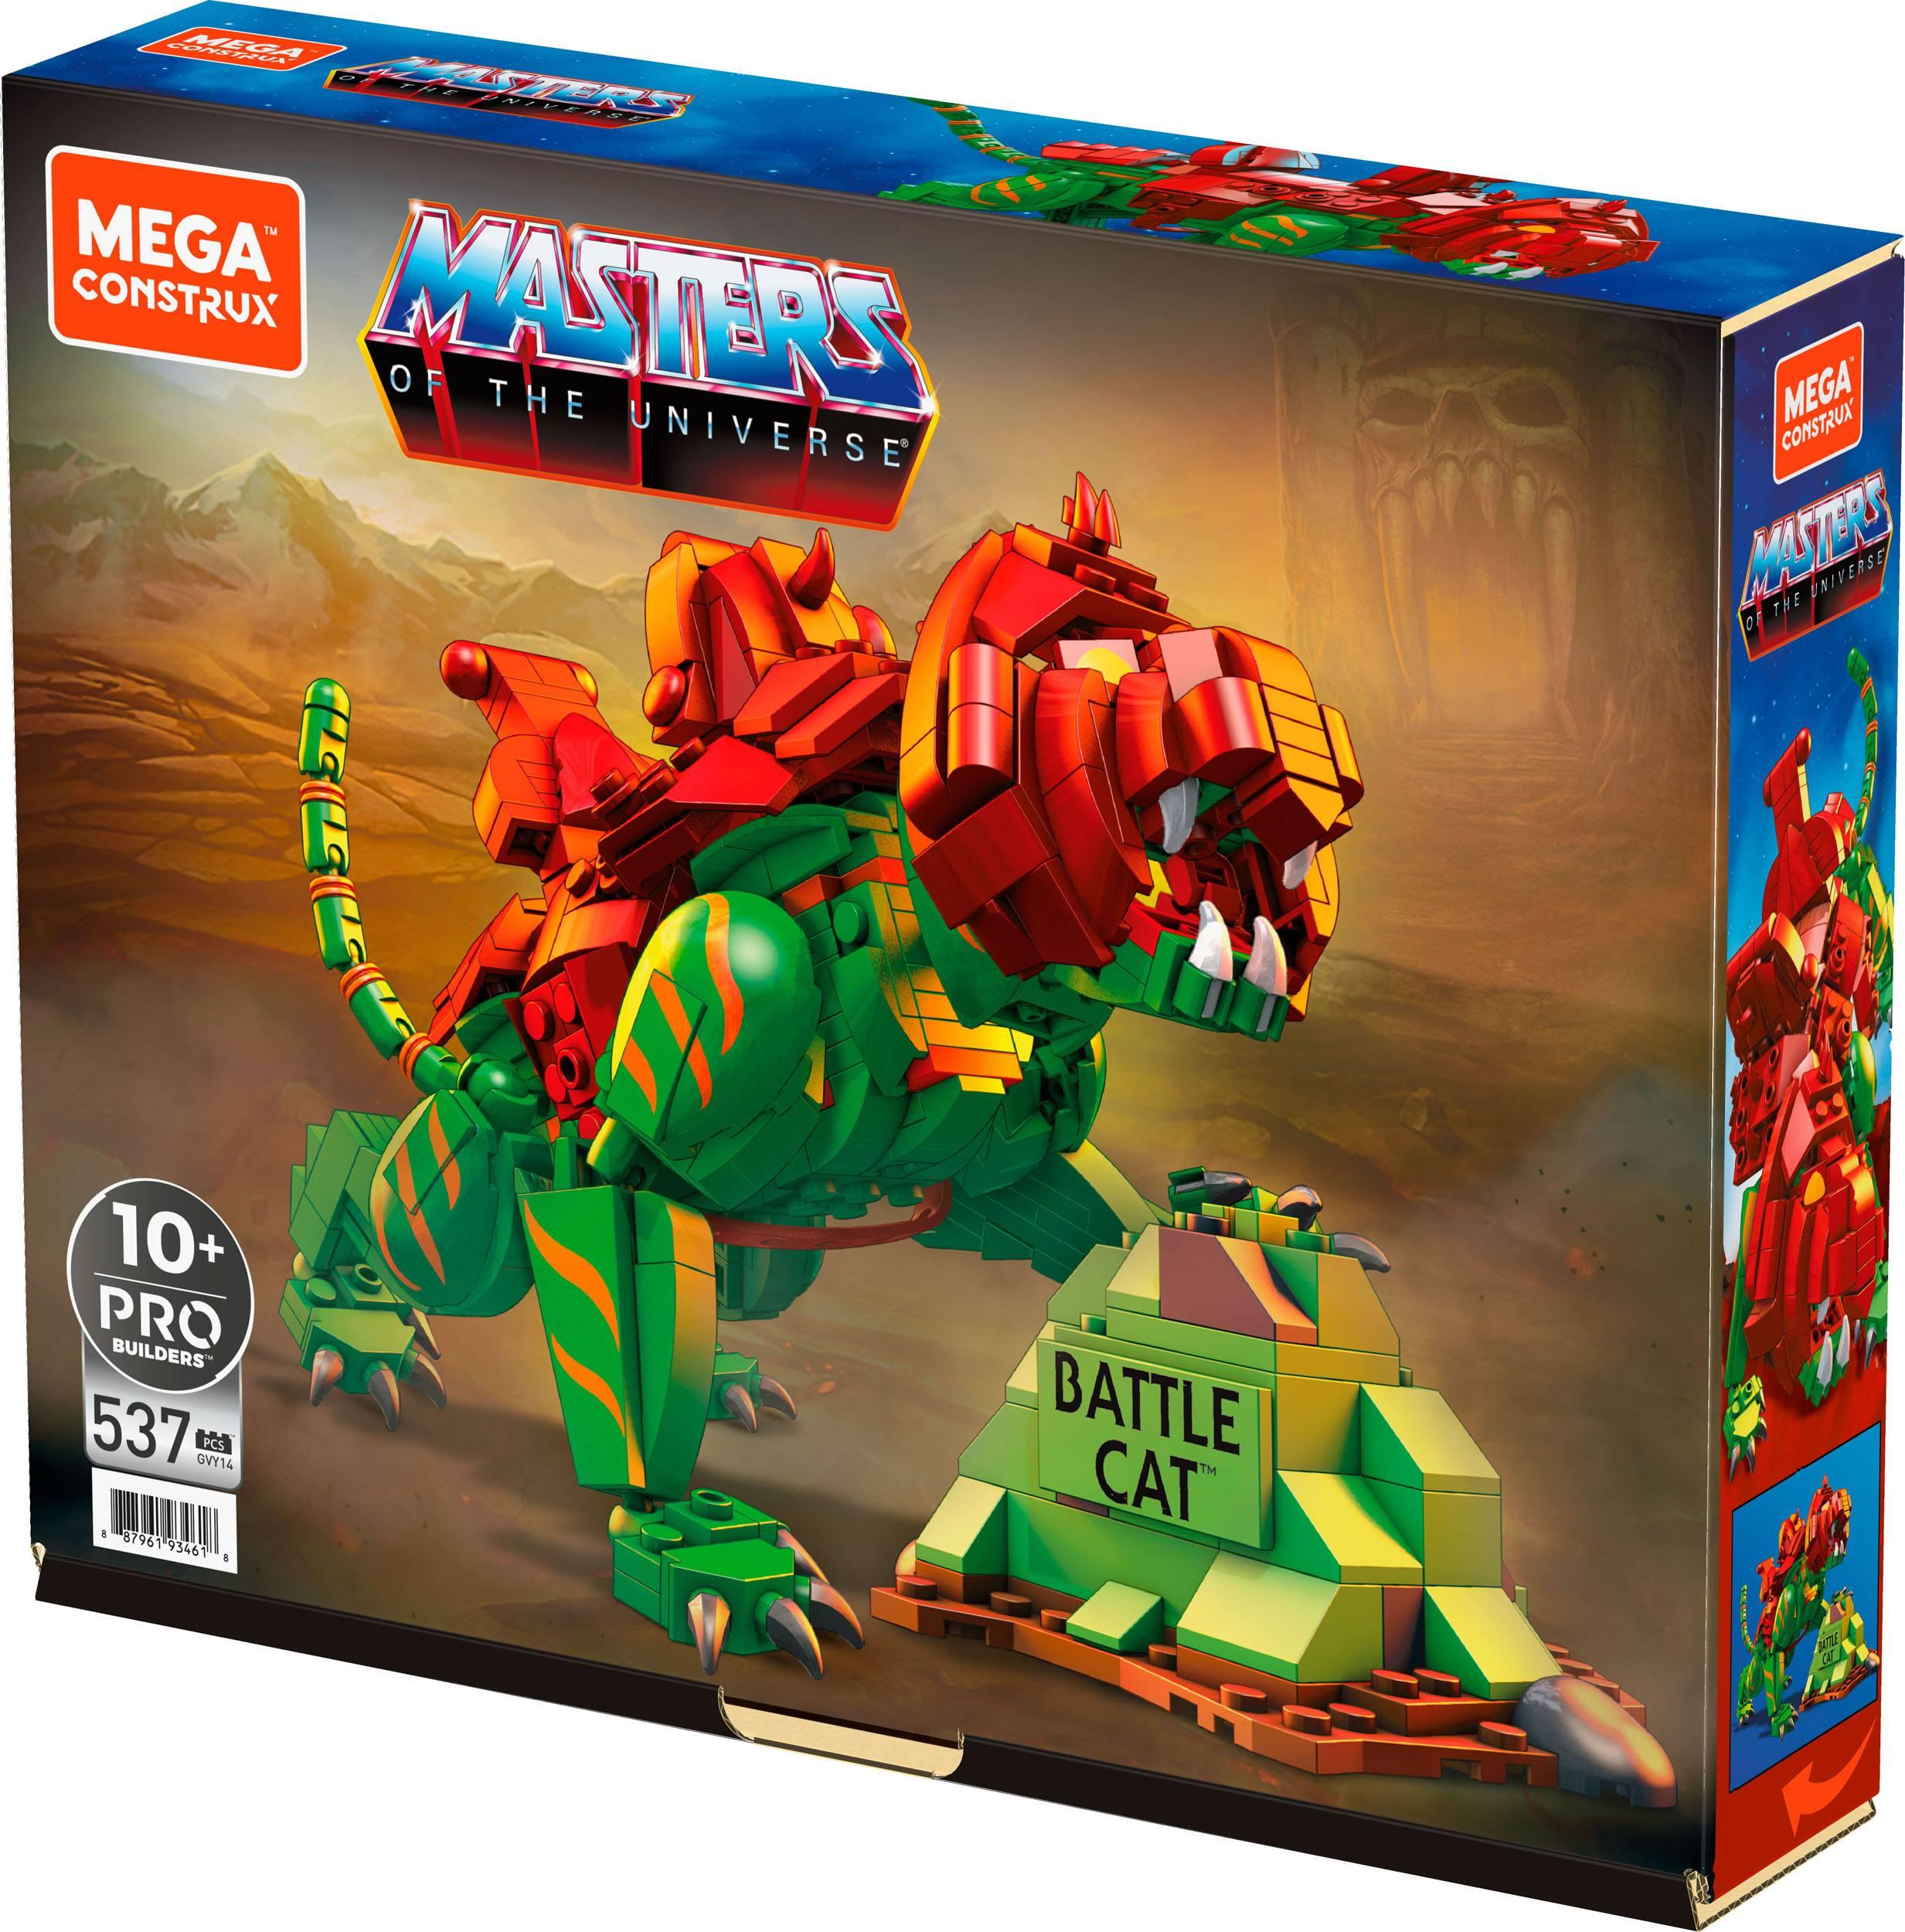 Mega Construx Masters of the Universe Origins Battle Cat GVY14-0 0887961934618